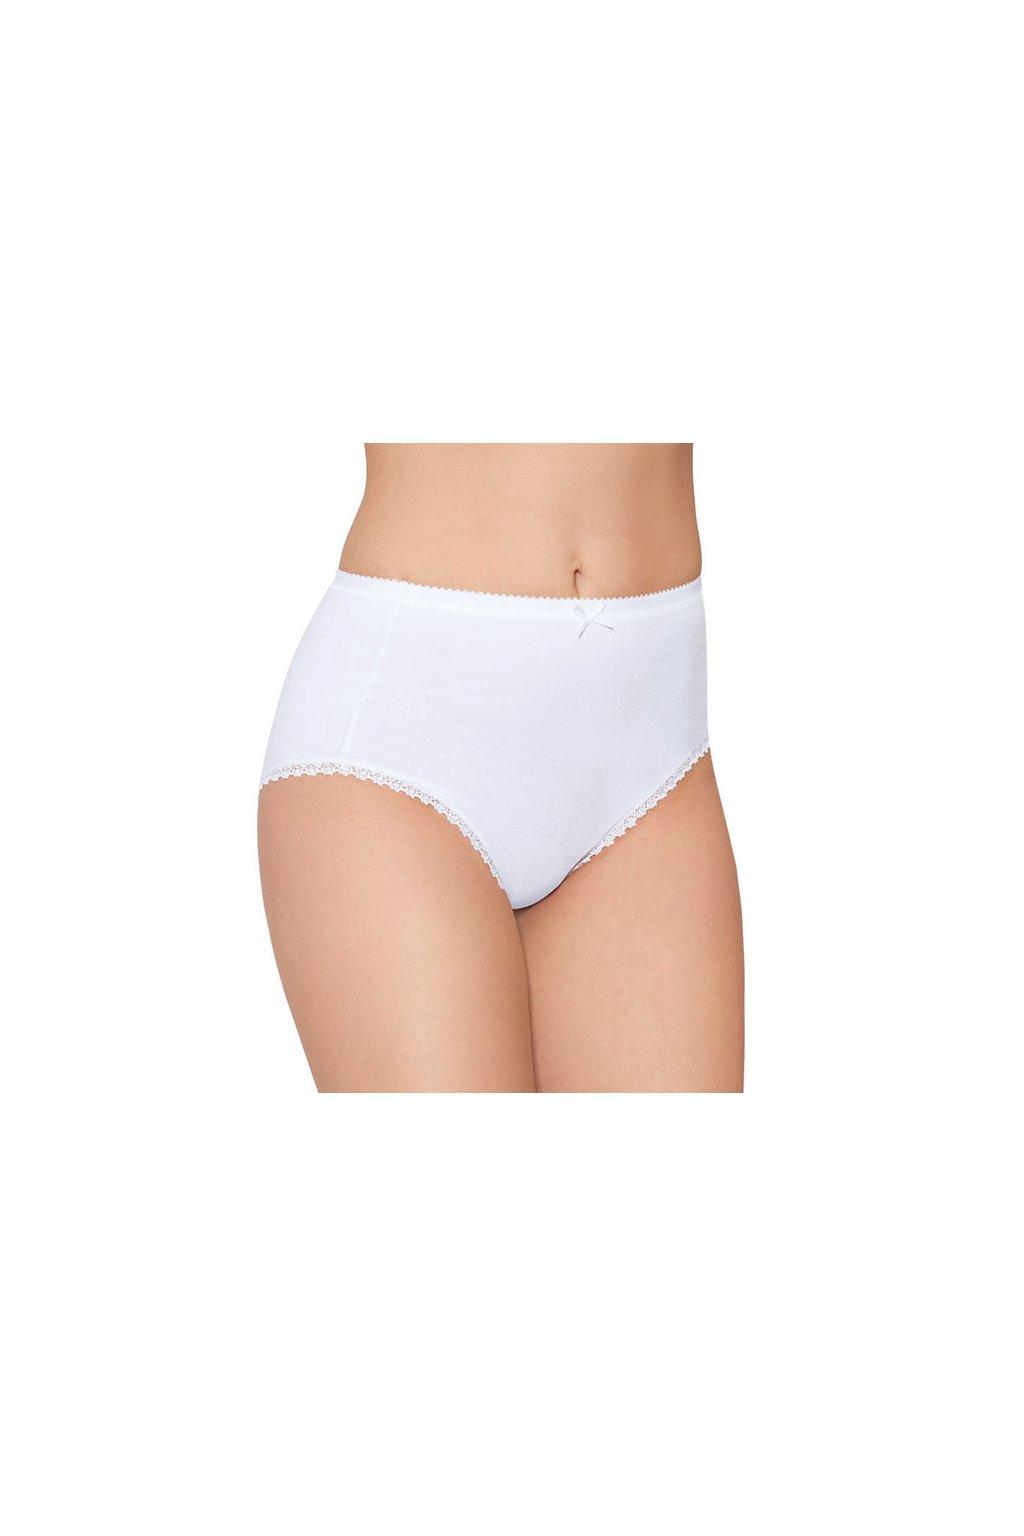 Dámské kalhotky, 10061 1, bílá